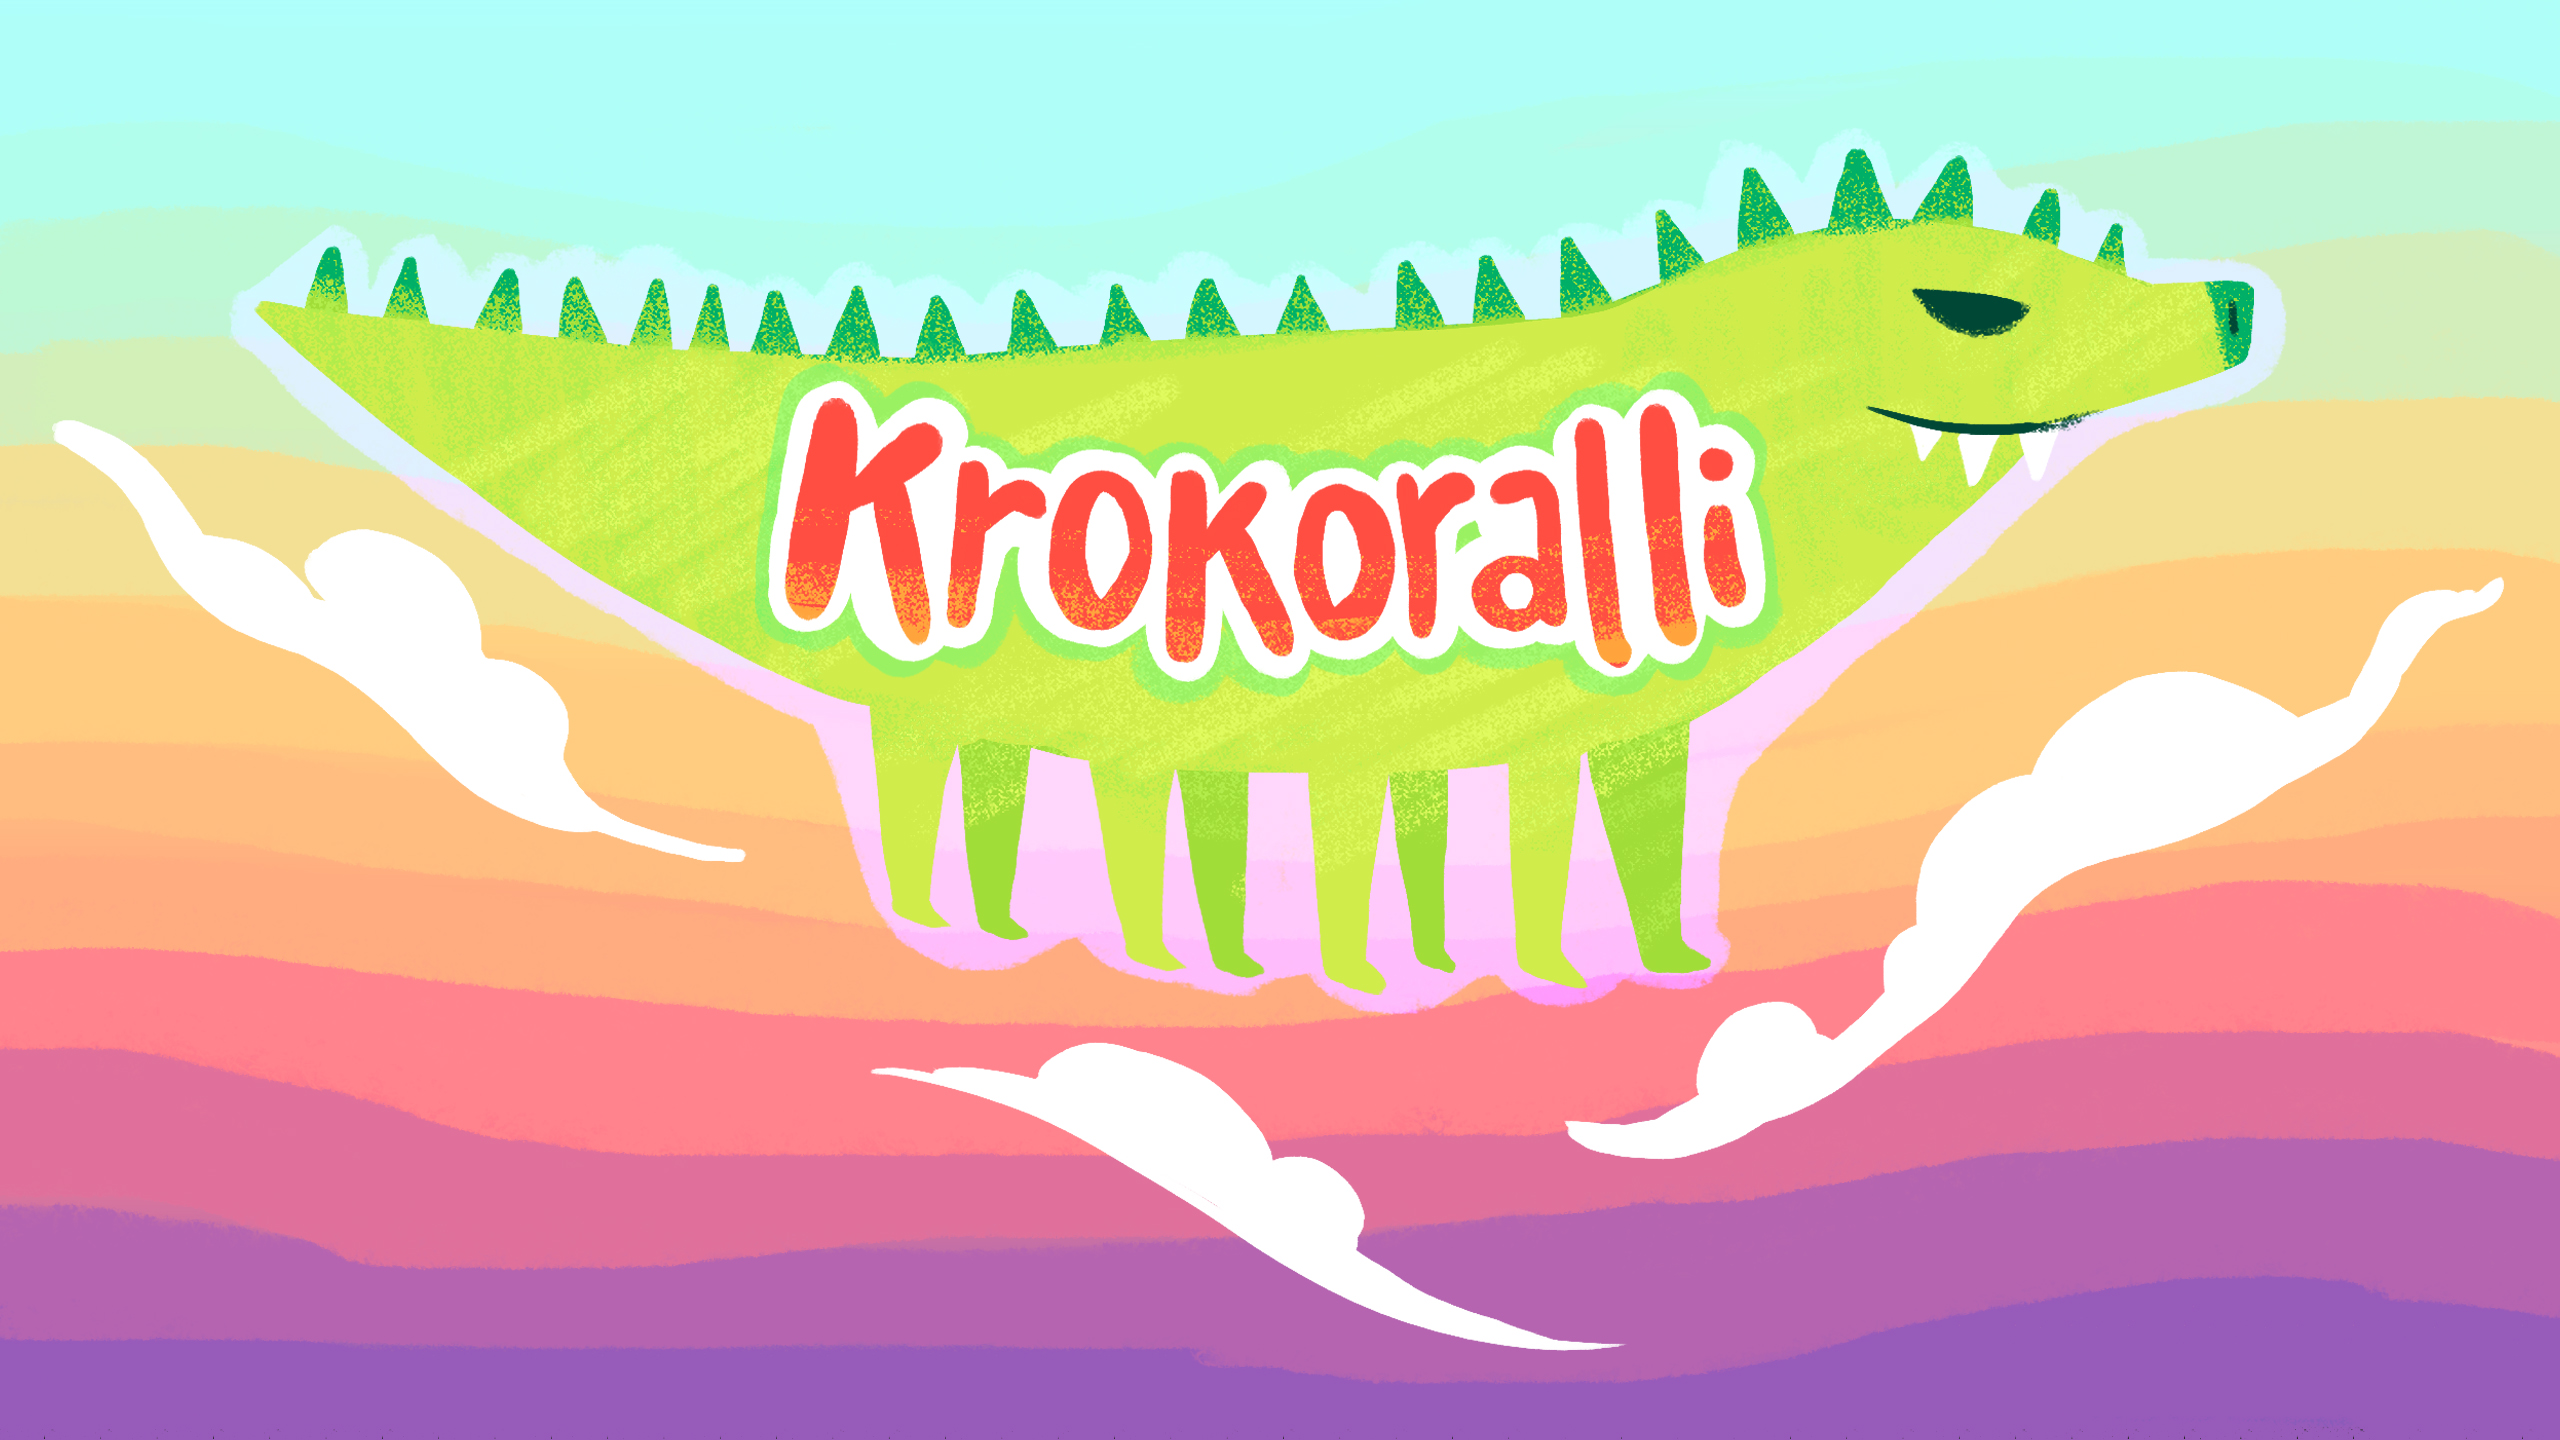 Krokoralli